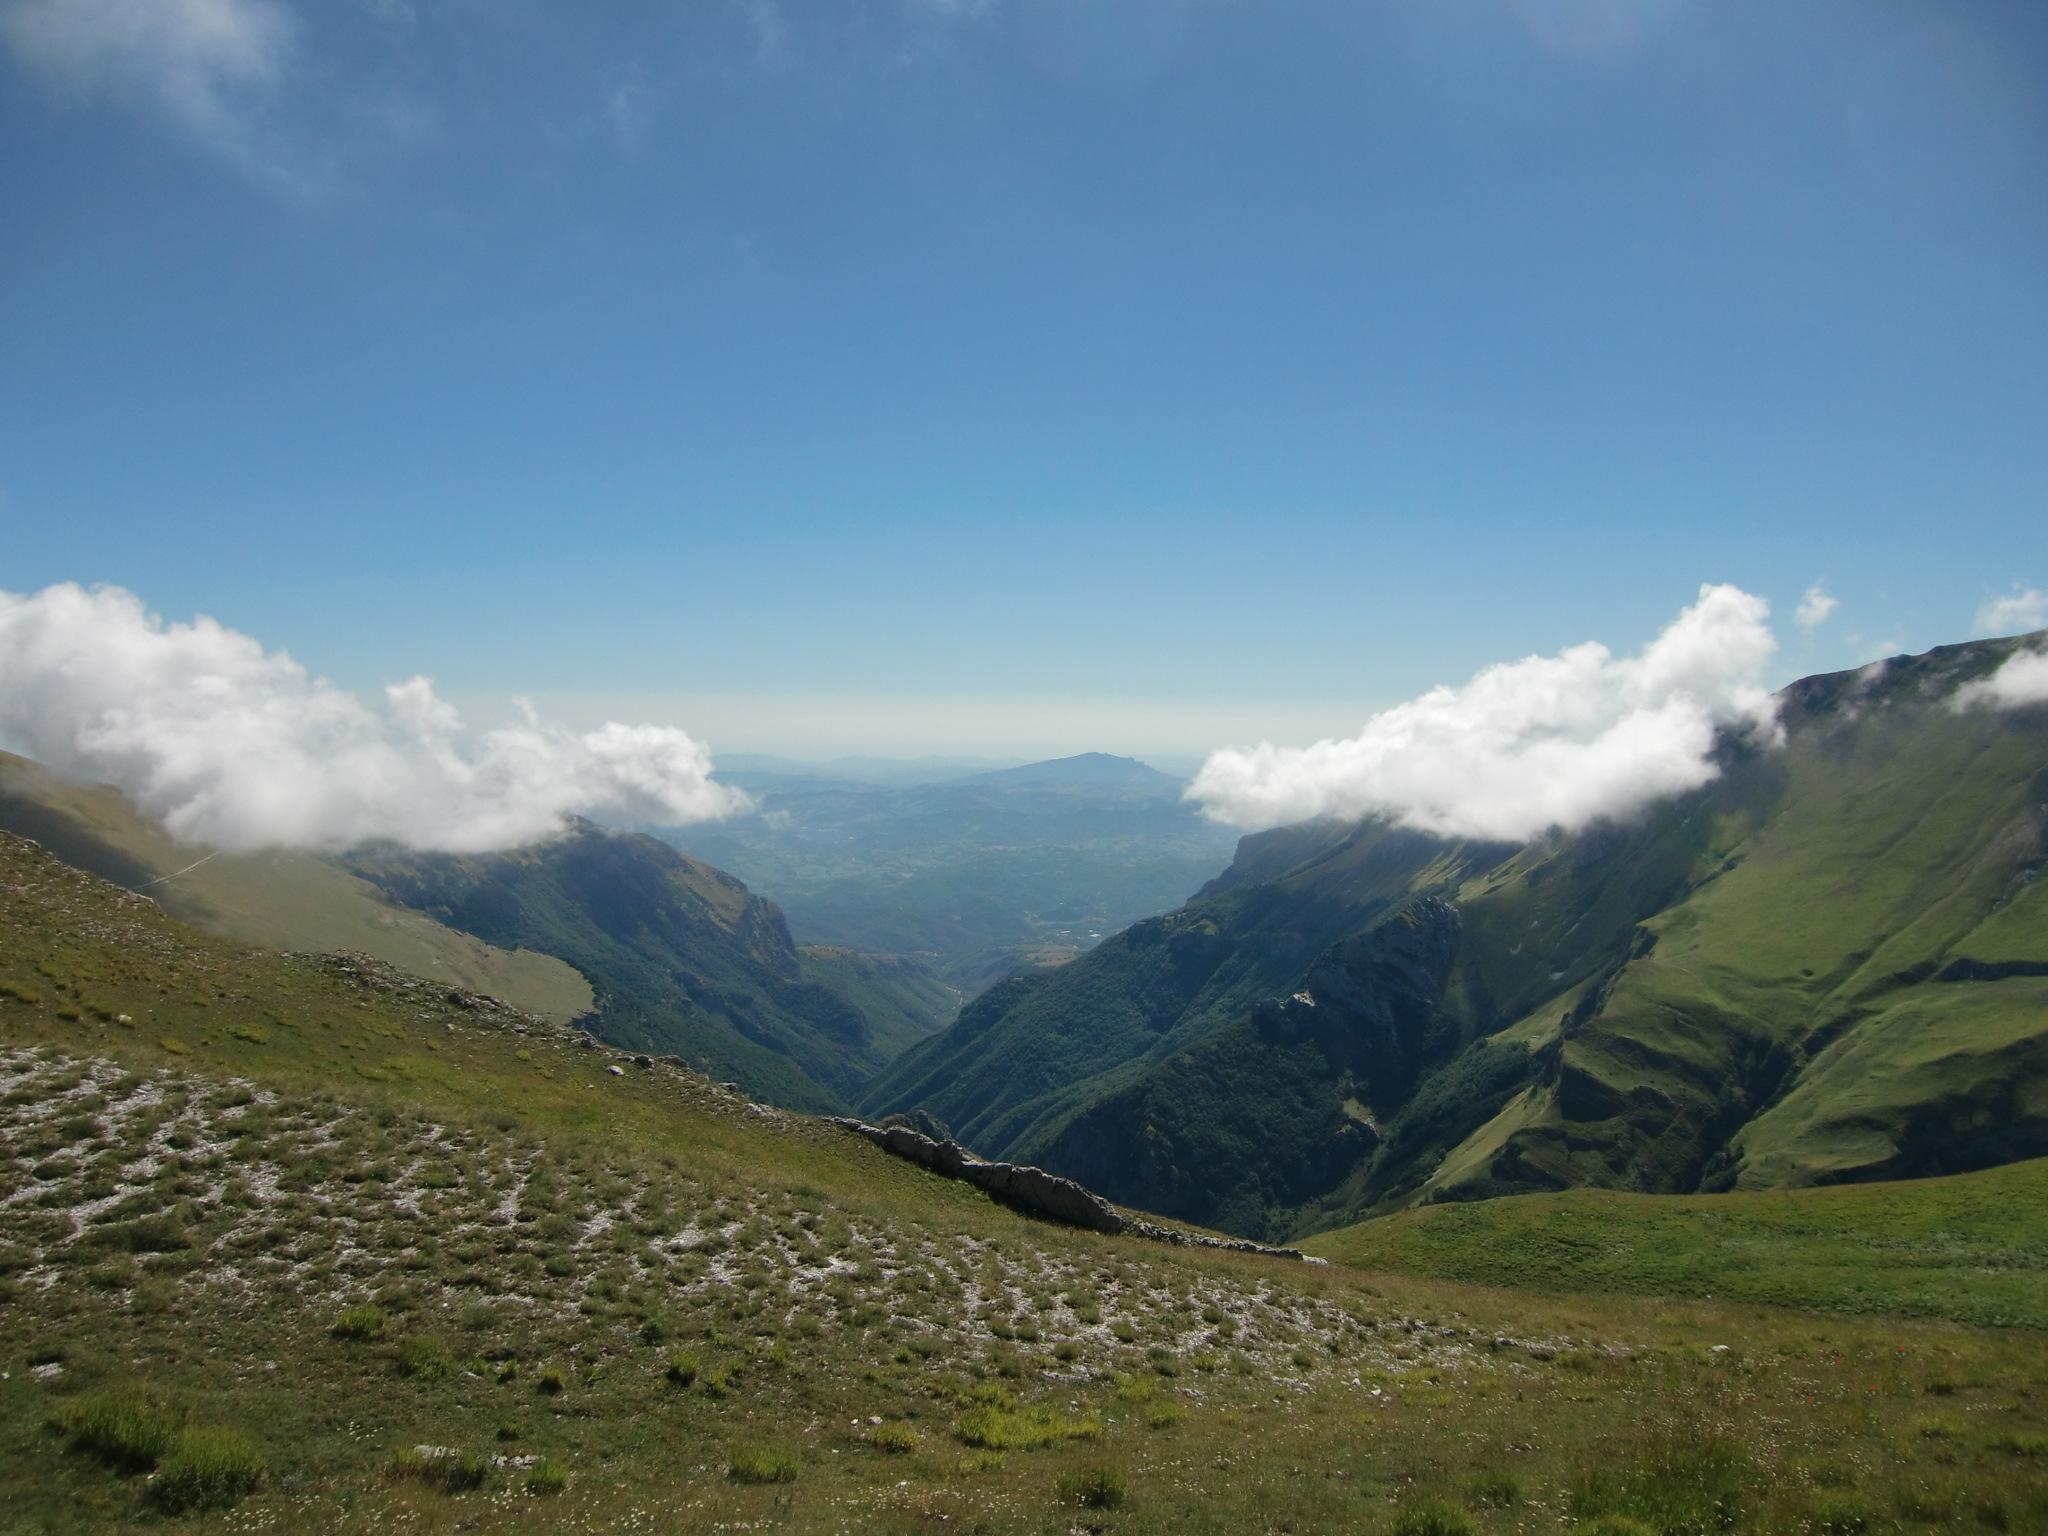 Monti Sibillini - Panorama da Forcella Angagnola